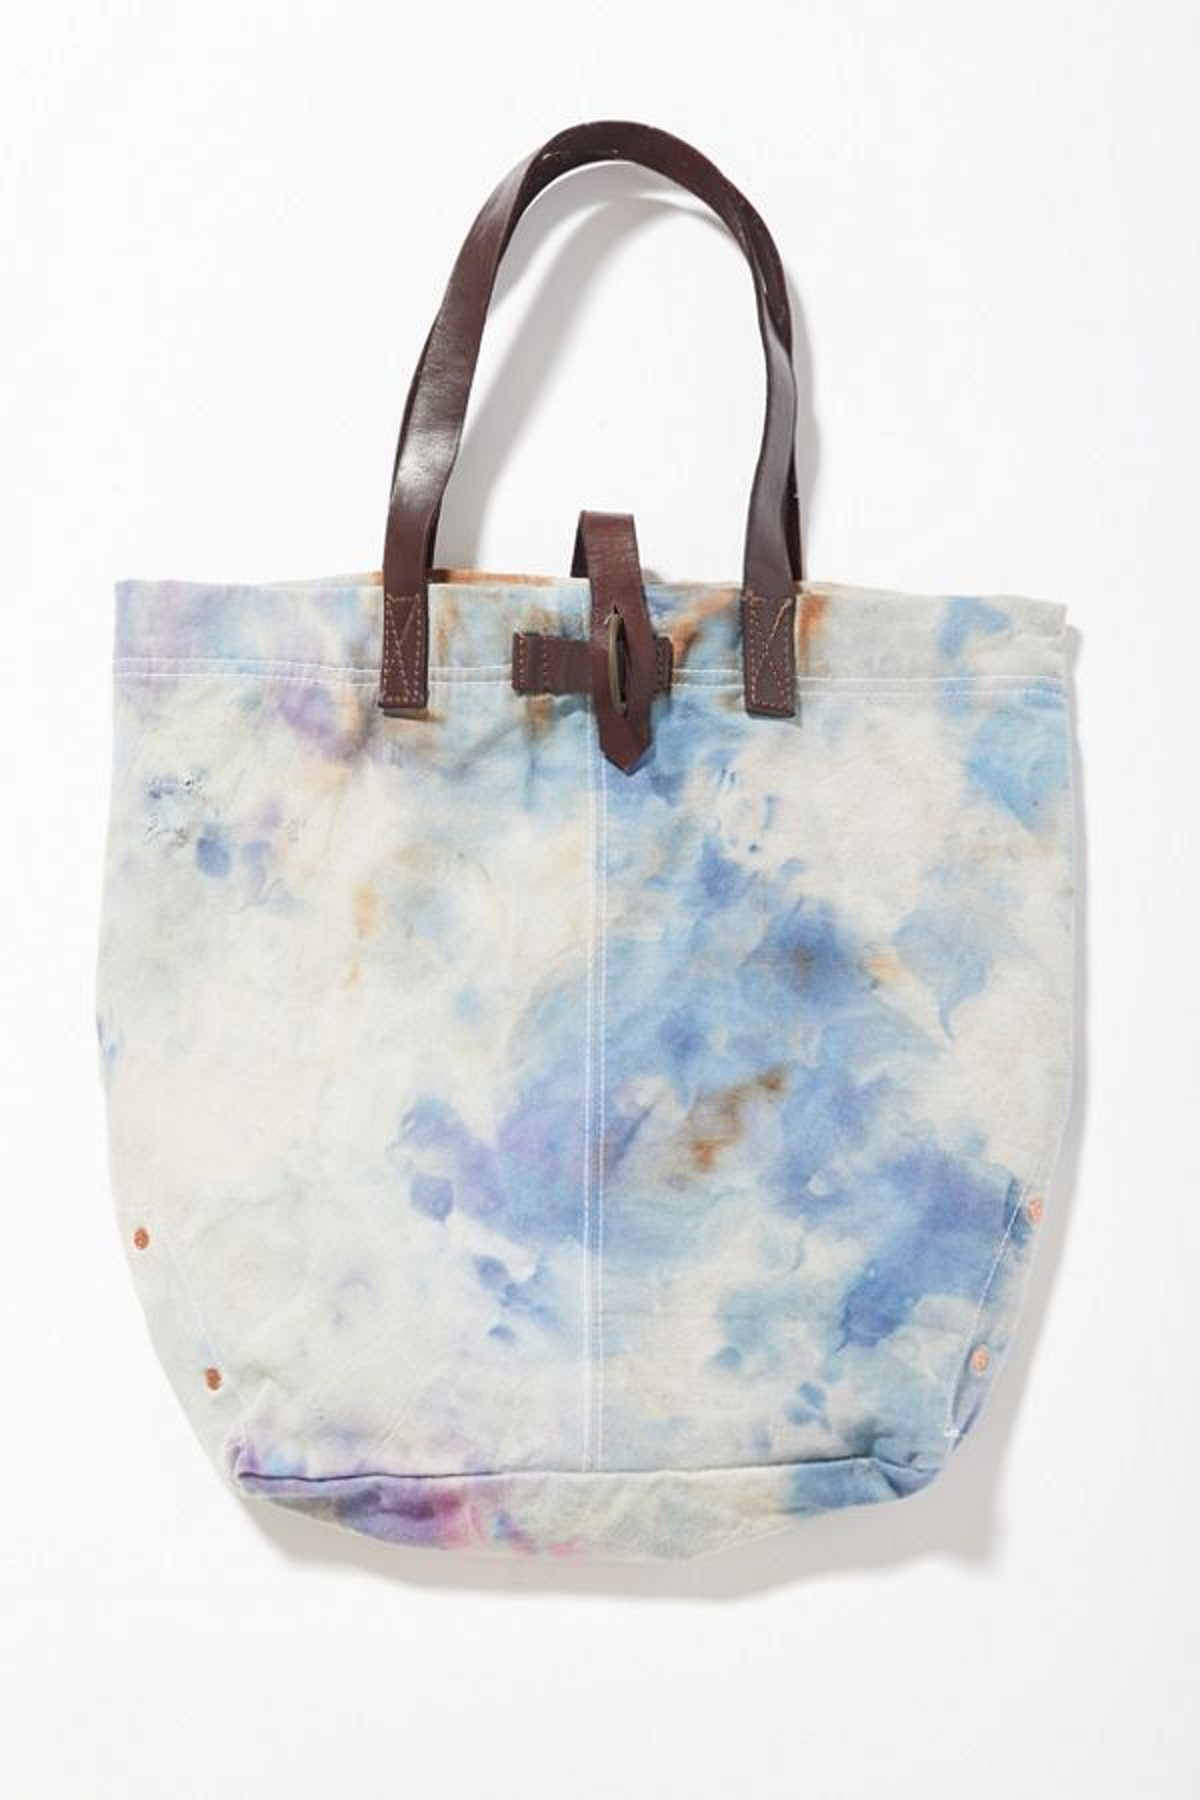 Vintage Riverside Tool & Dye Hand-Dyed Tote Bag